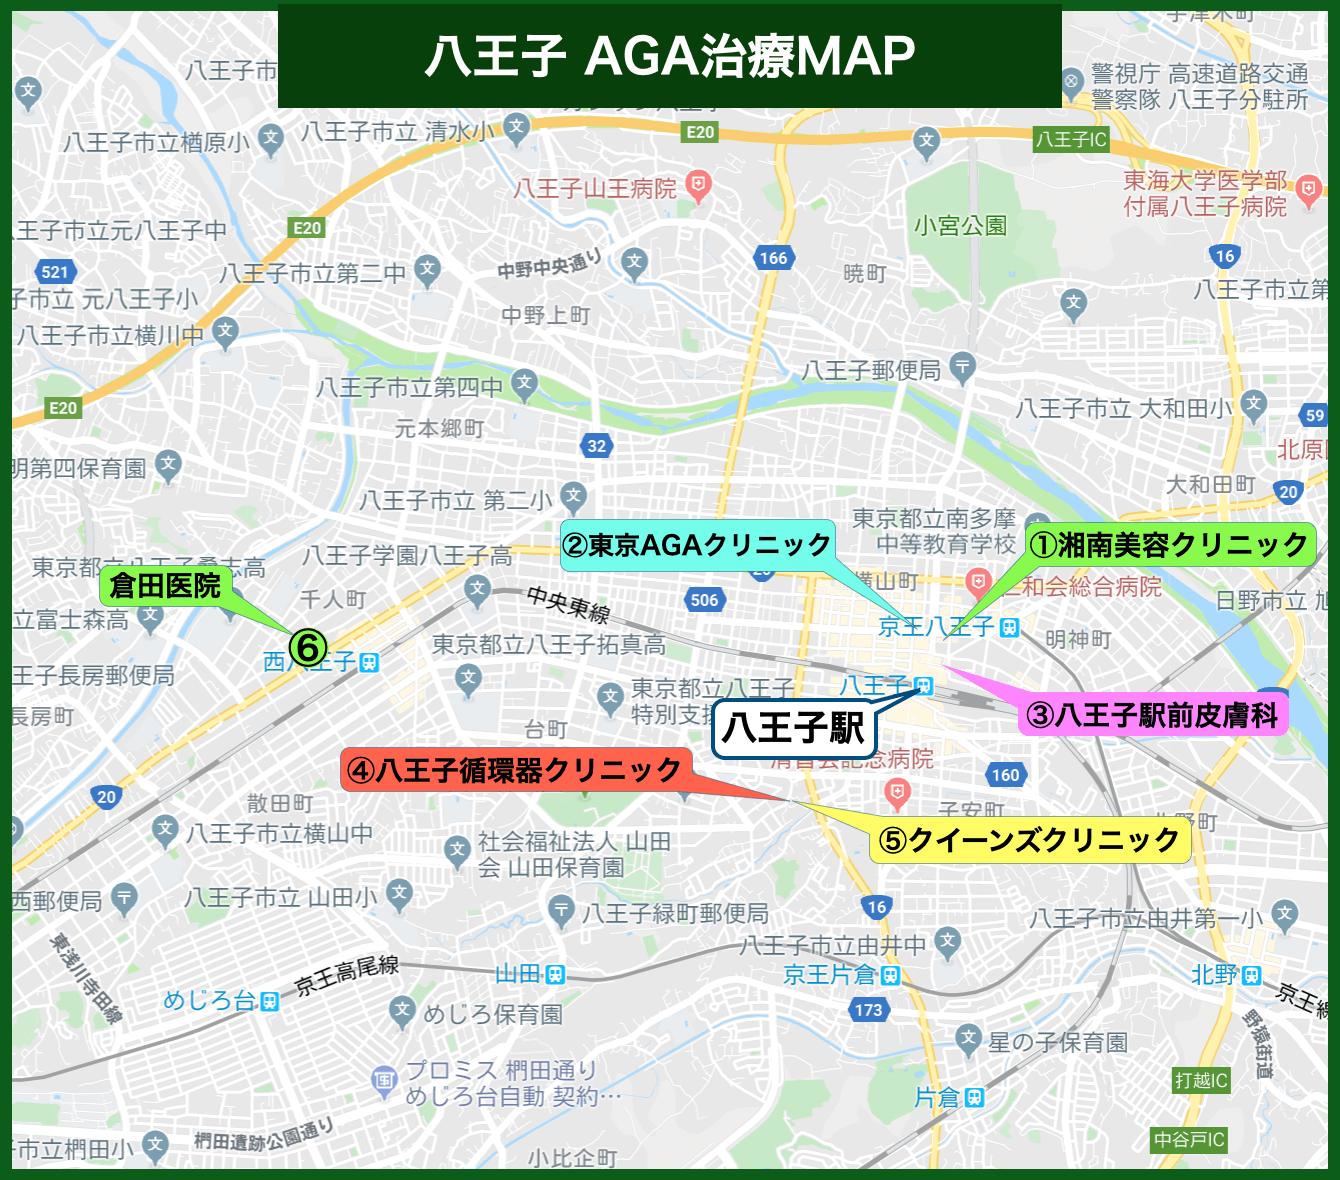 八王子 AGA治療MAP